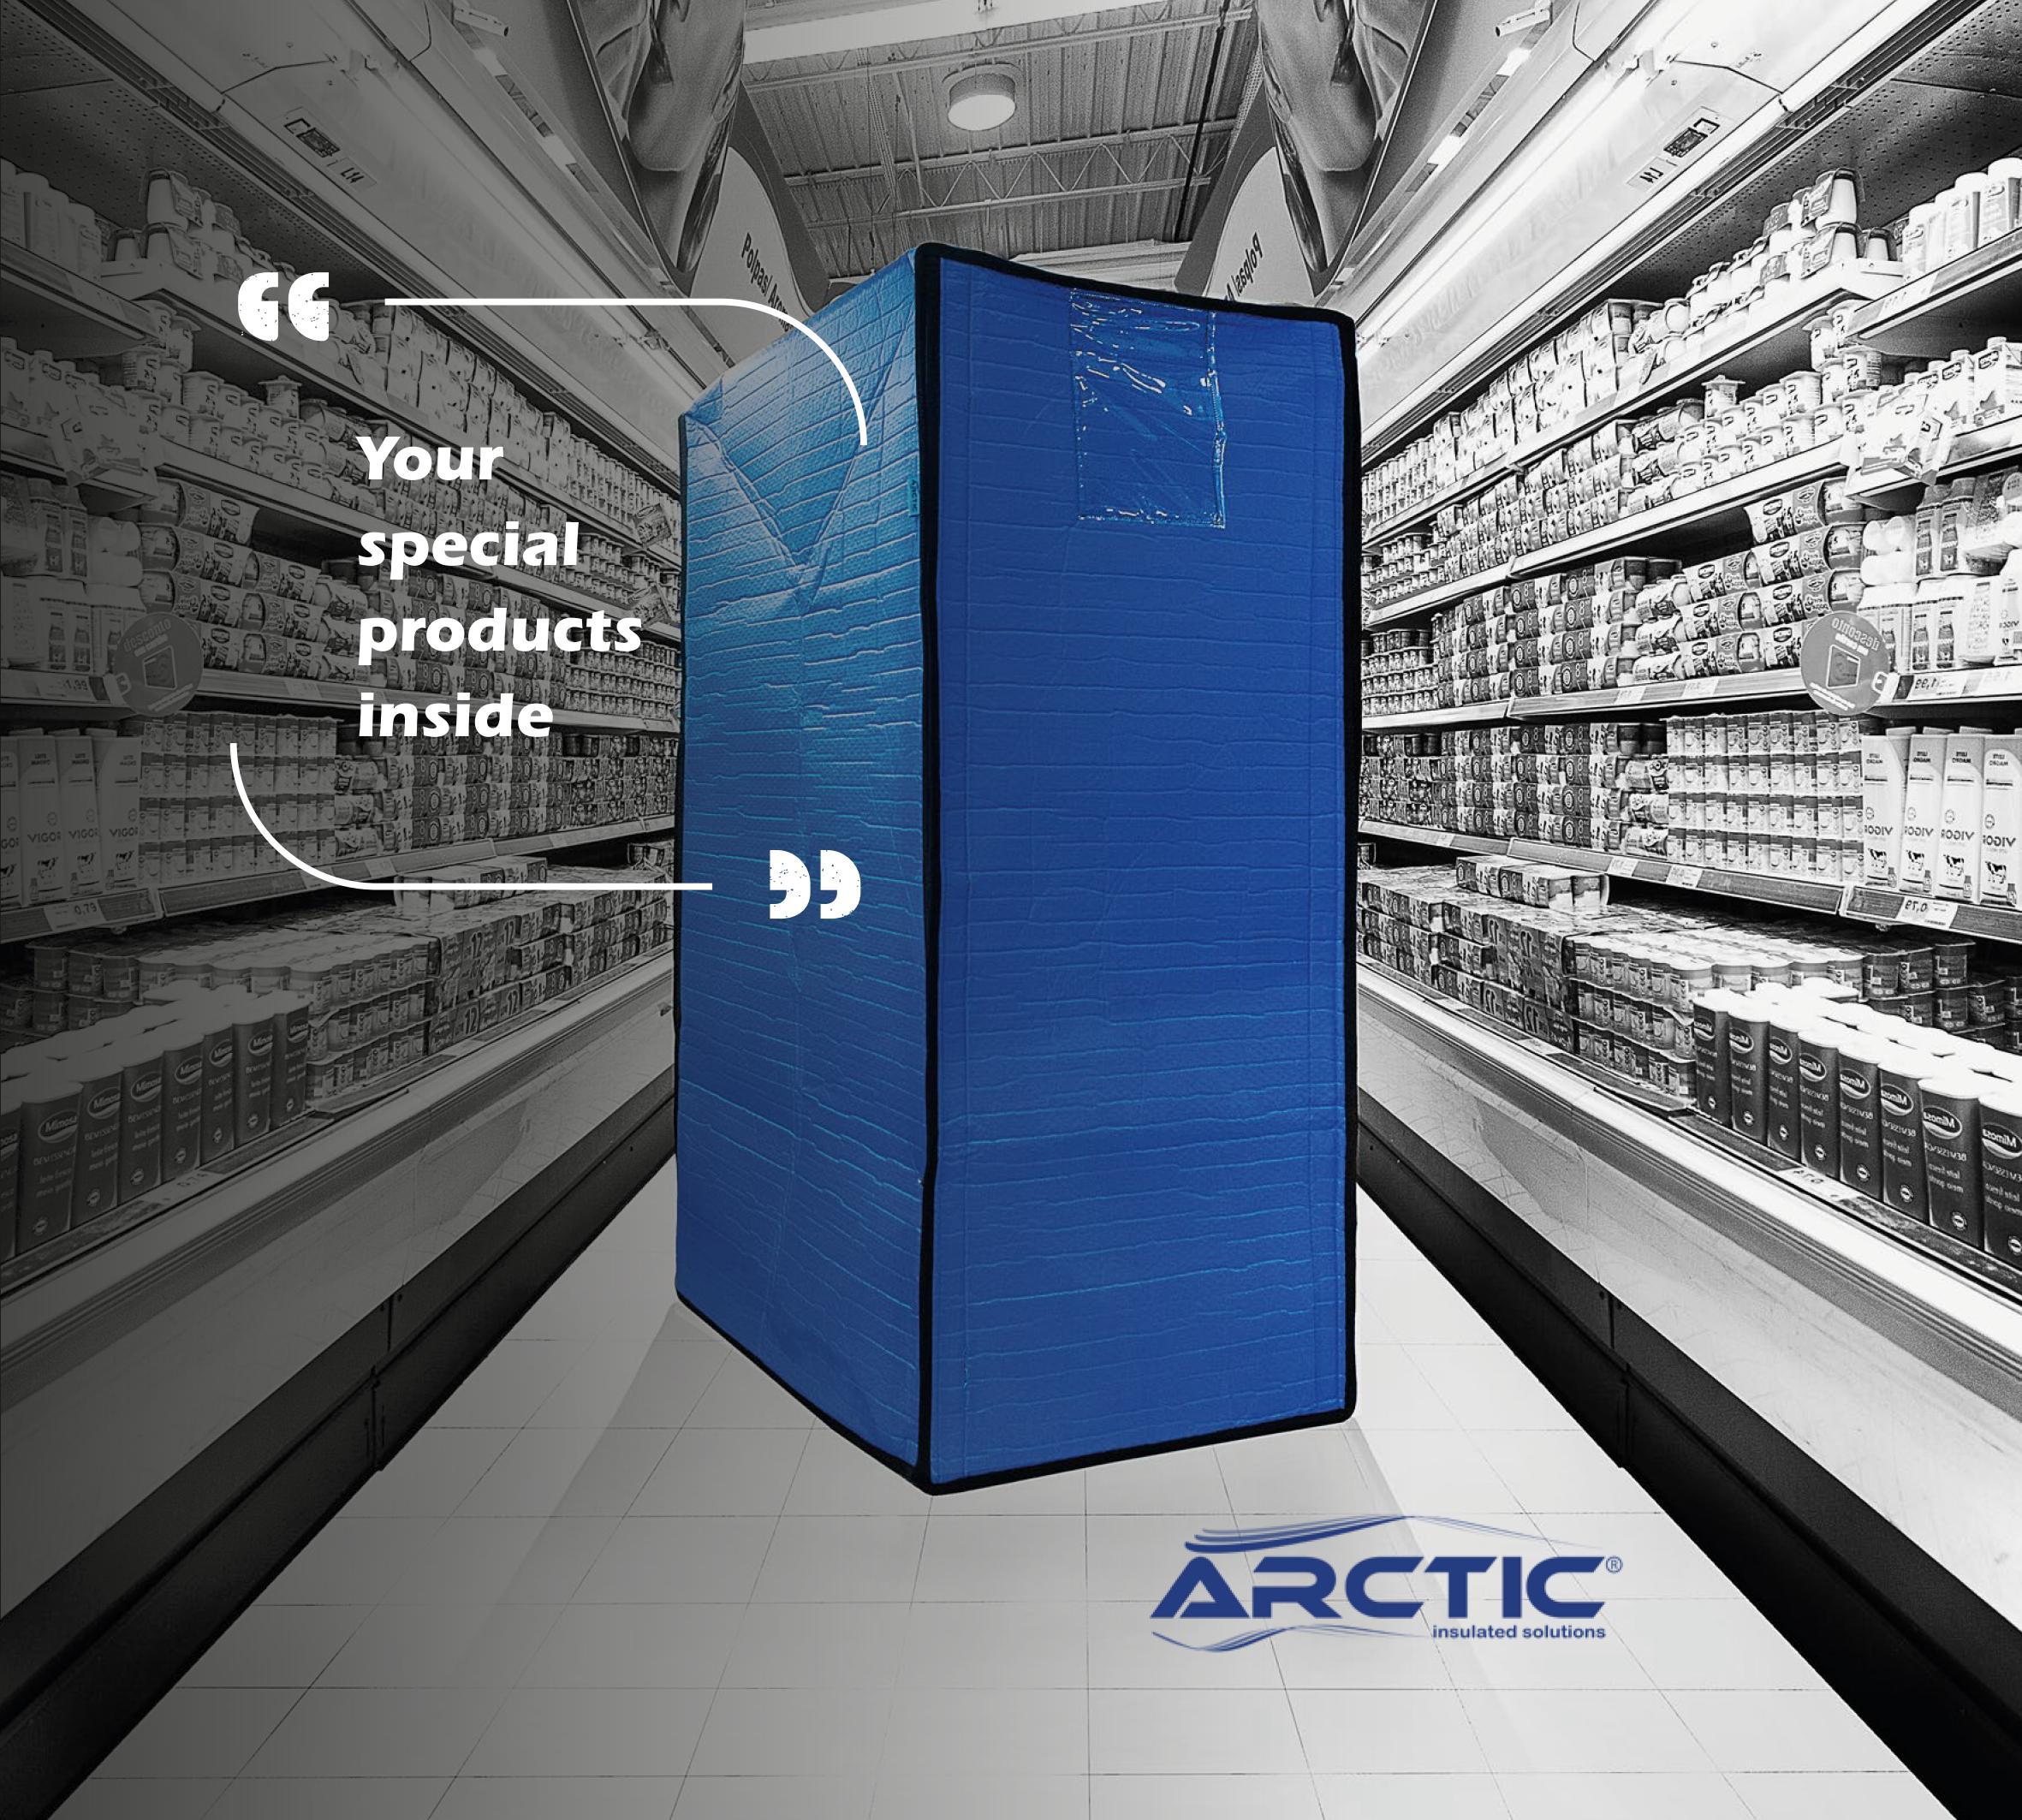 ARCTIC Soluções isotérmicas, coberturas